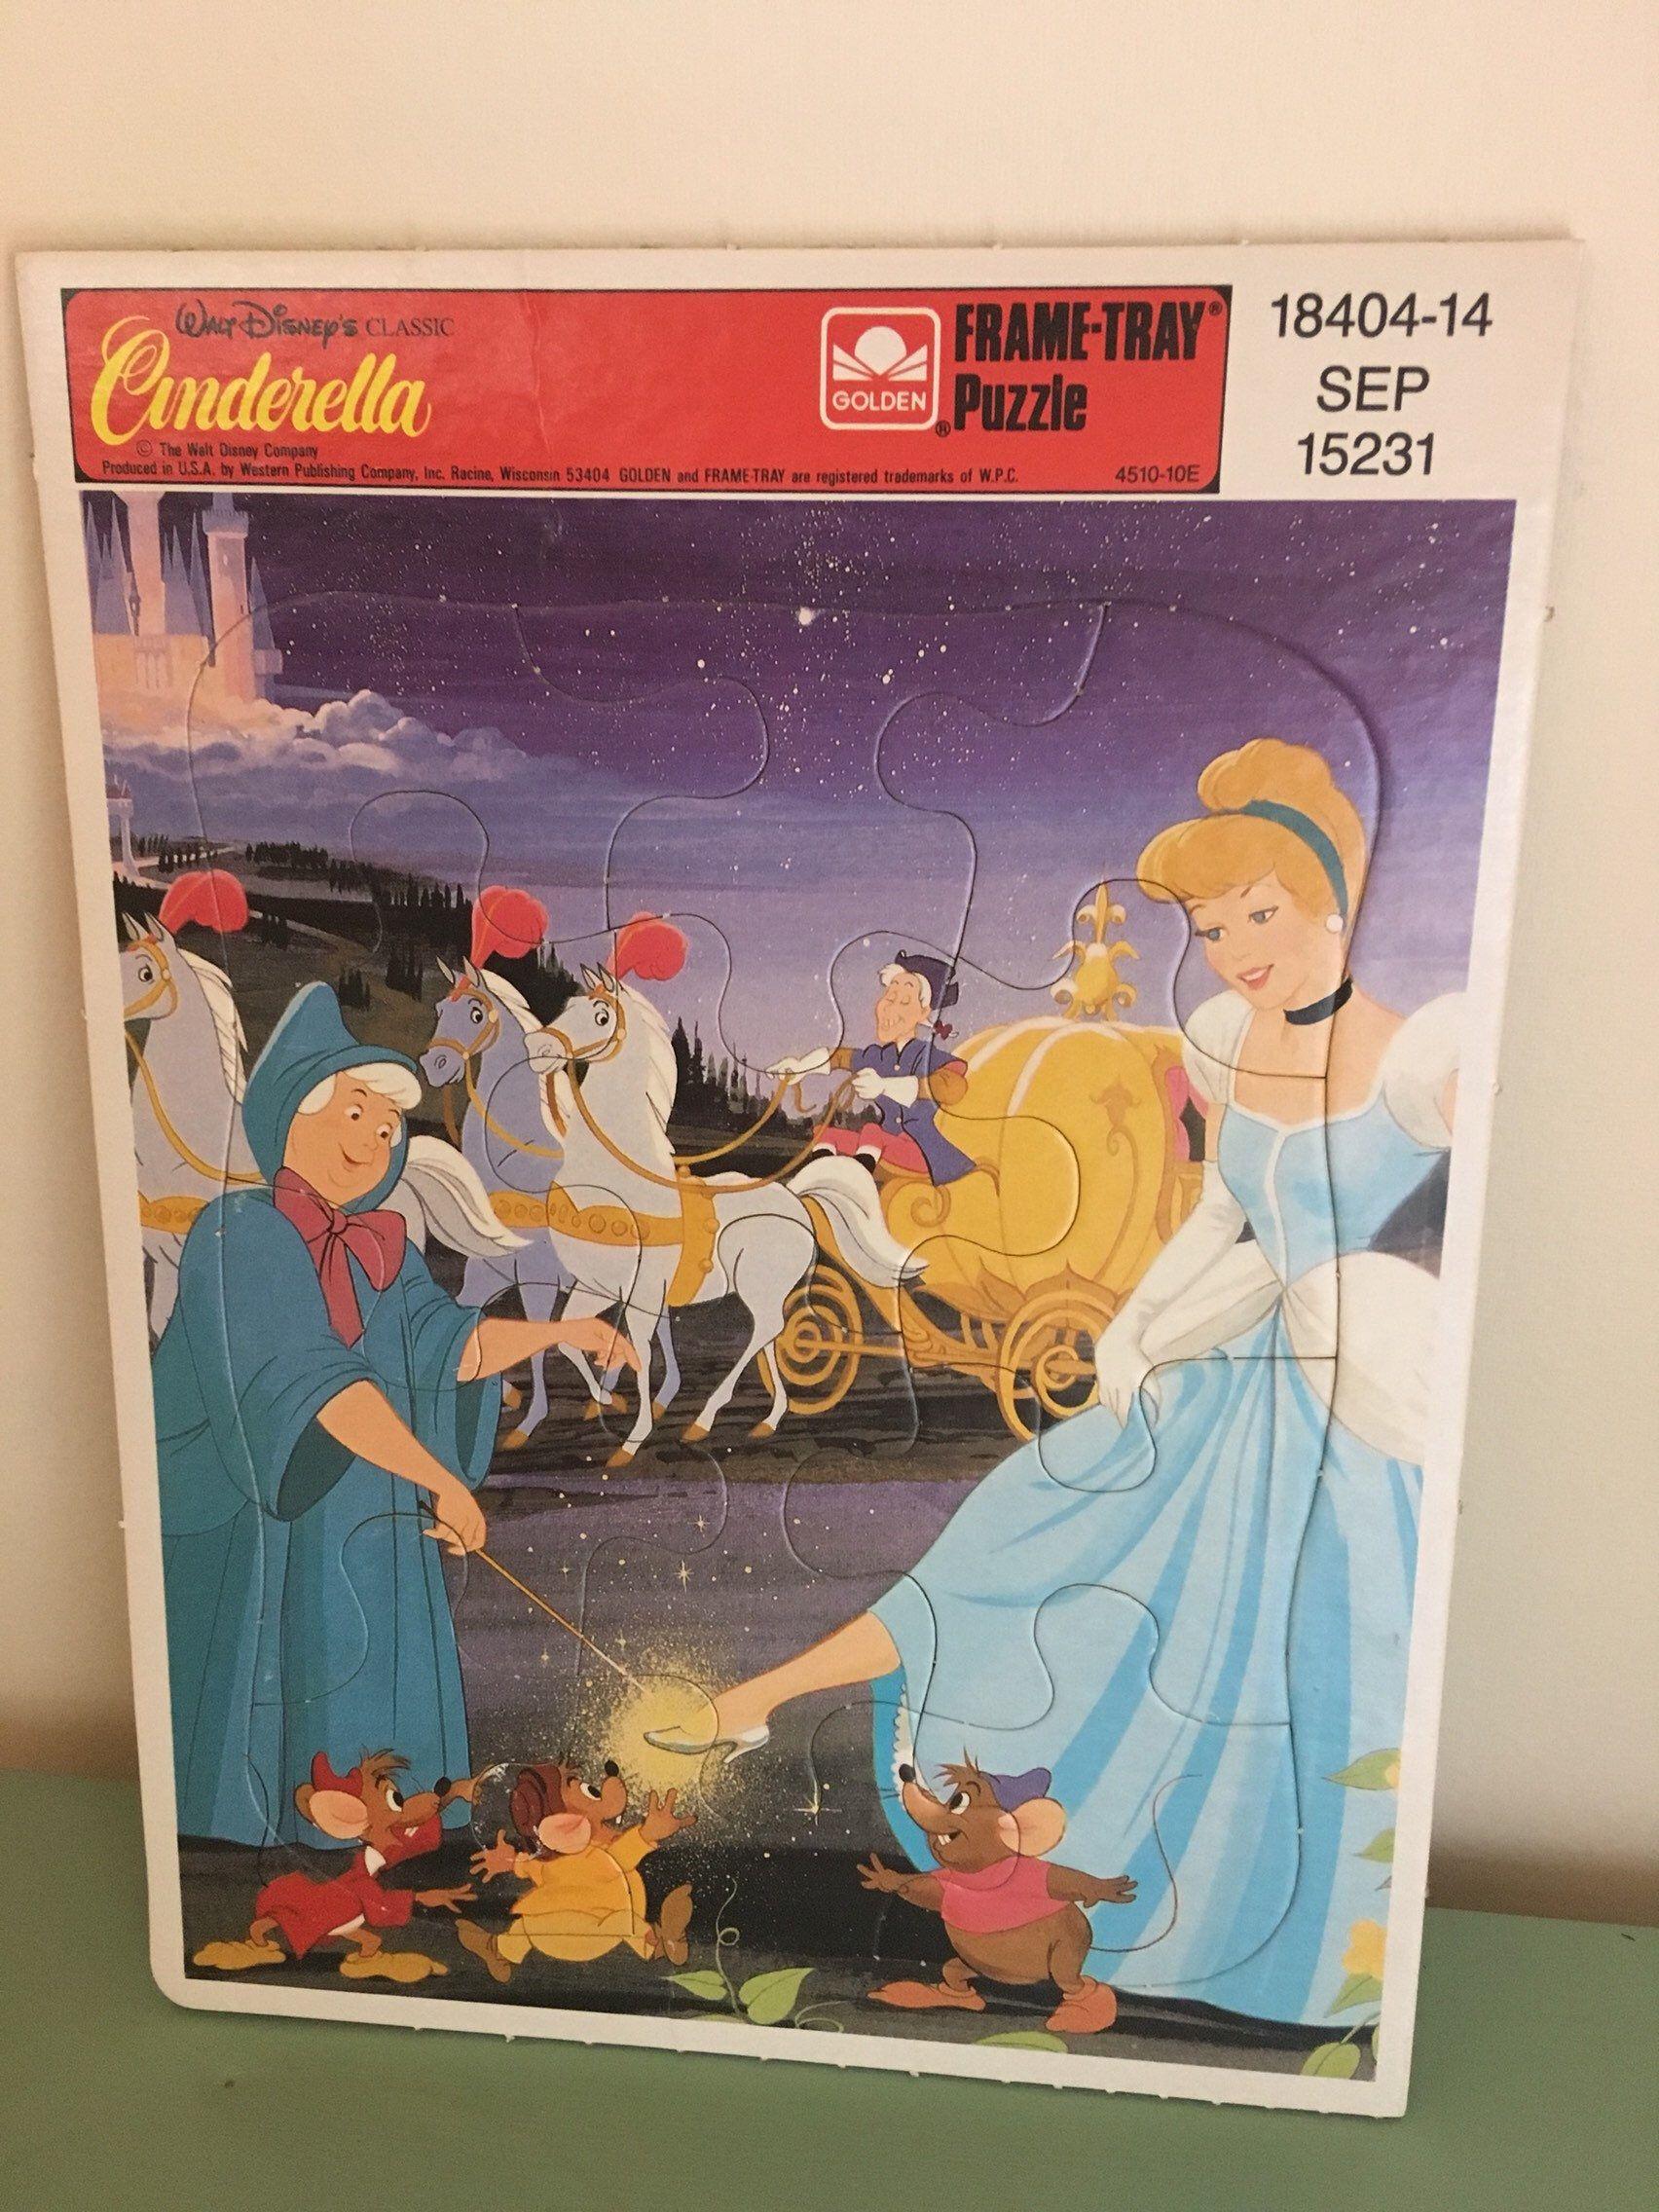 80 S Walt Disney S Classic Cinderella Frame Tray Disney Frames Frame Tray Vintage Disney